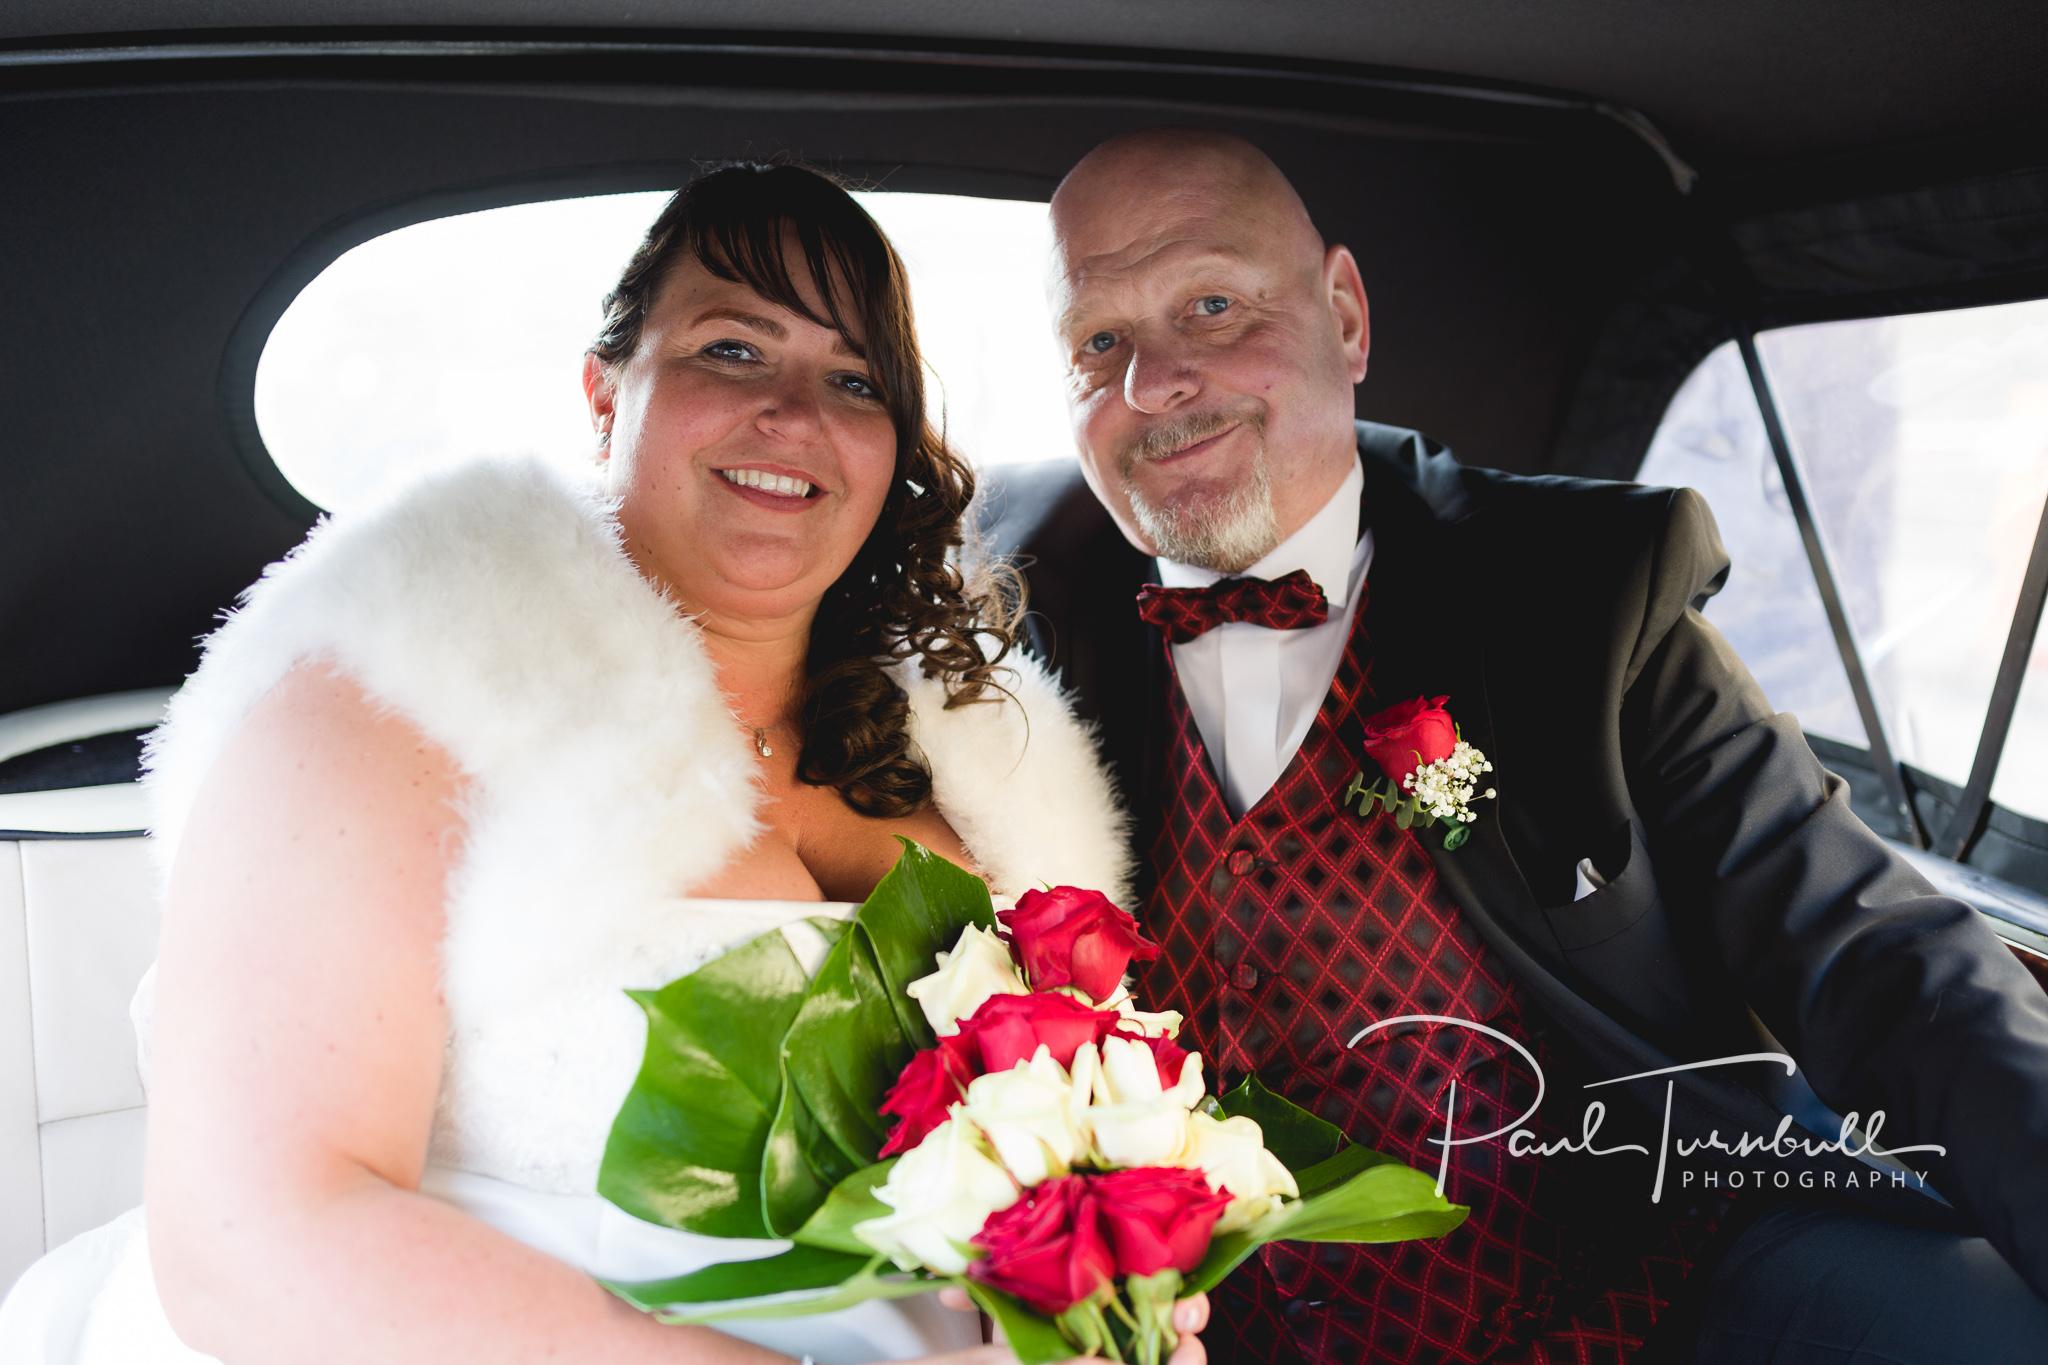 wedding-photographer-leeds-town-hall-011.jpg